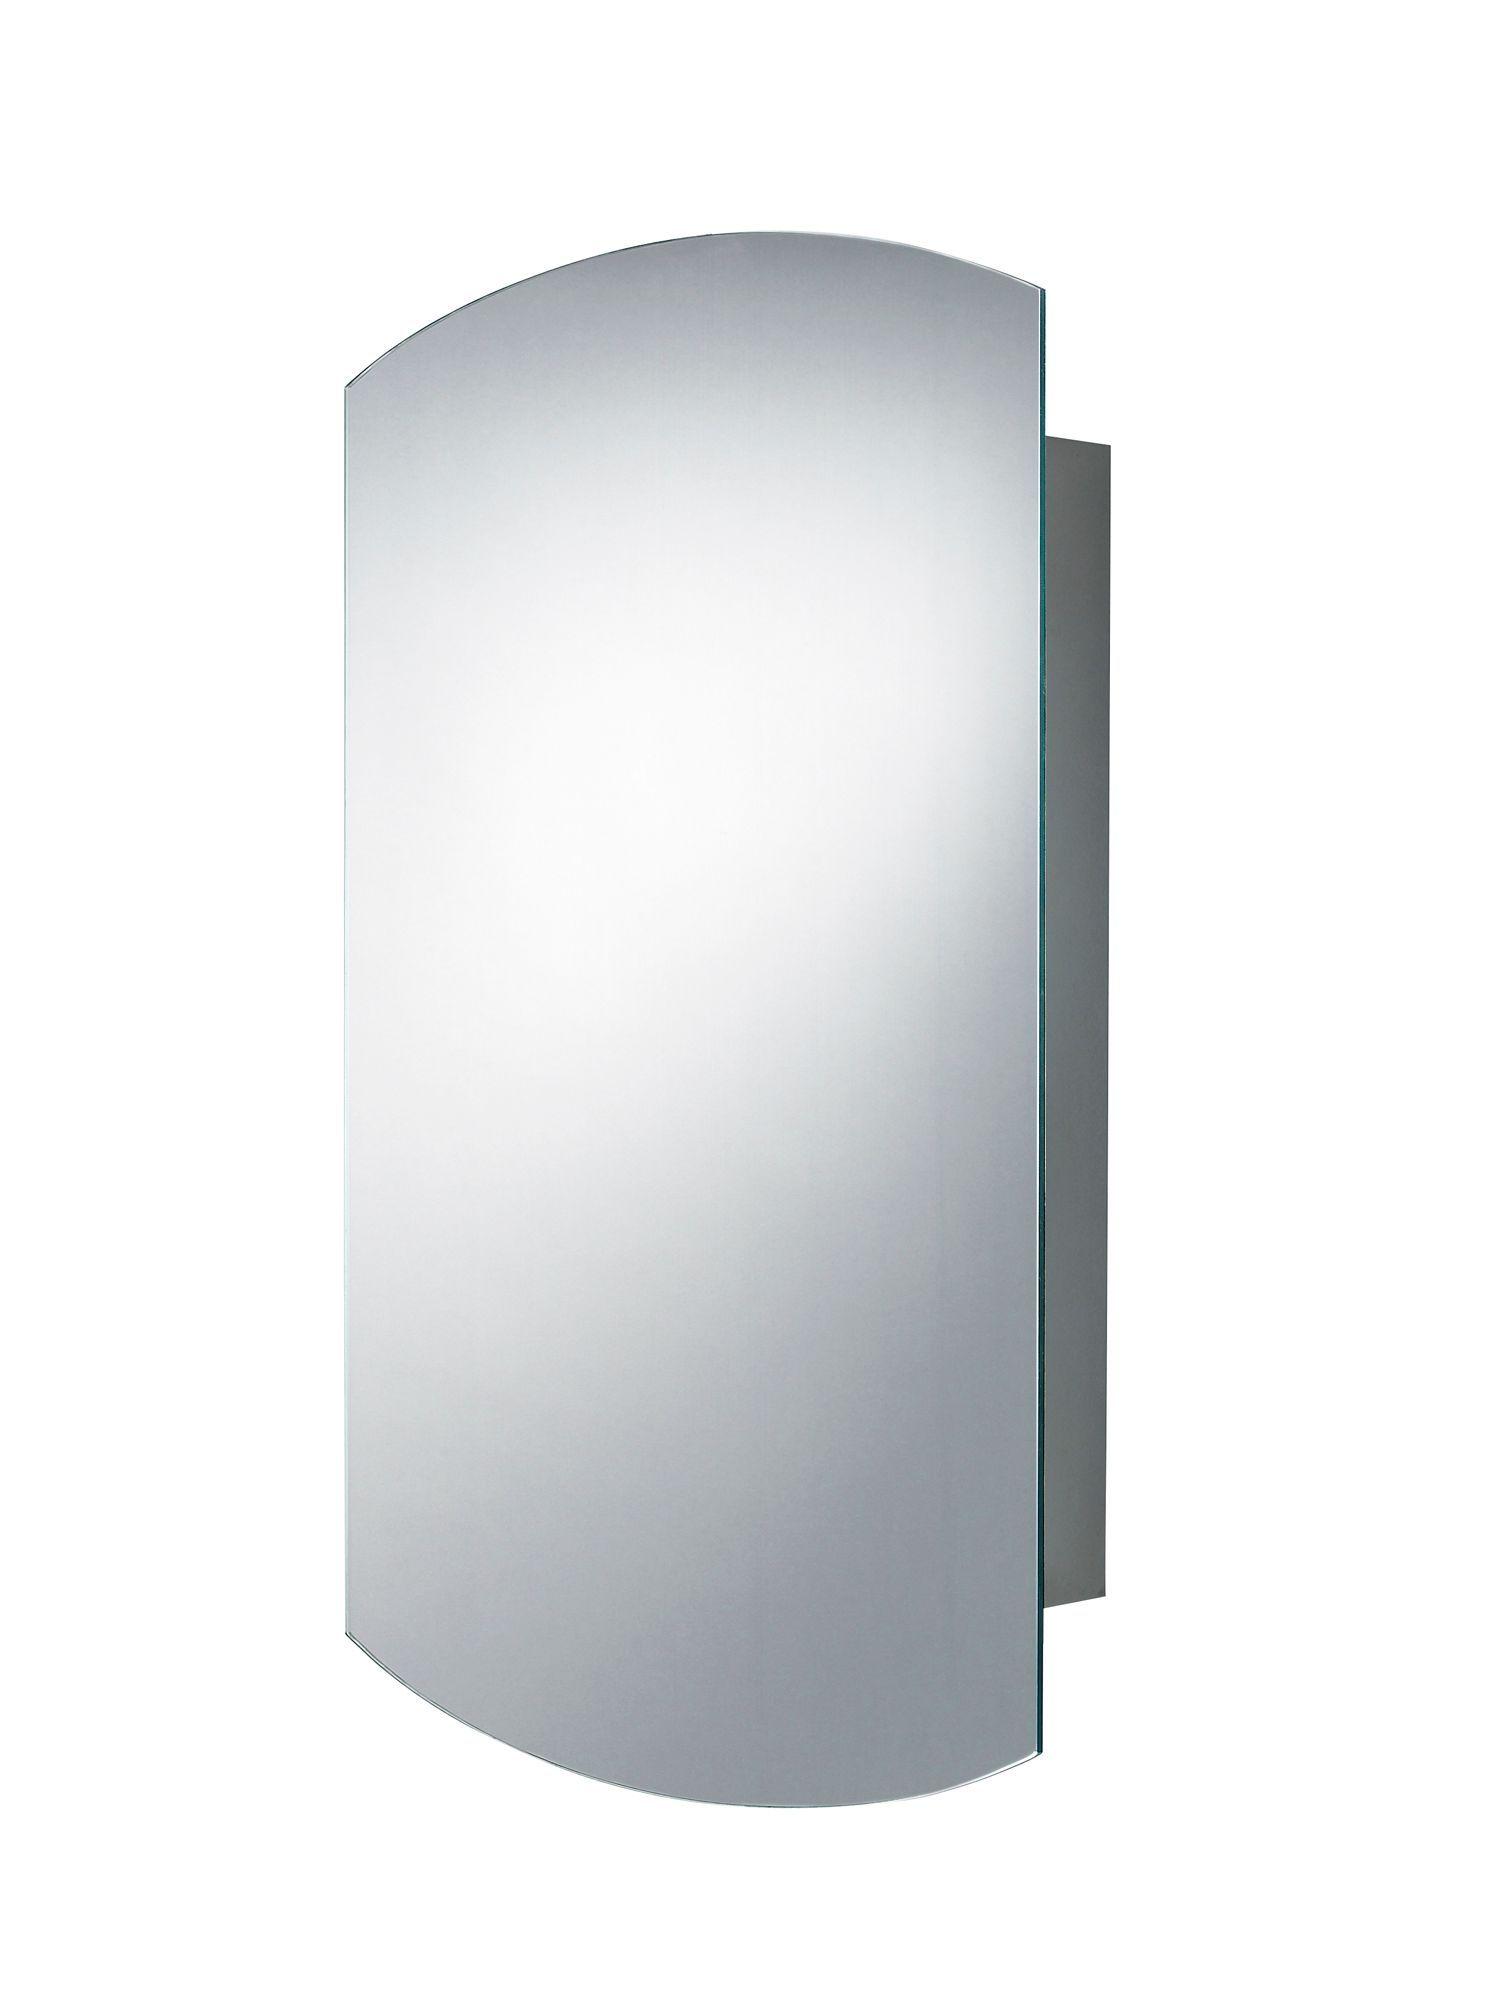 B&Q Fonteno Single Door Silver Mirror Cabinet | Pinterest | Mirror ...